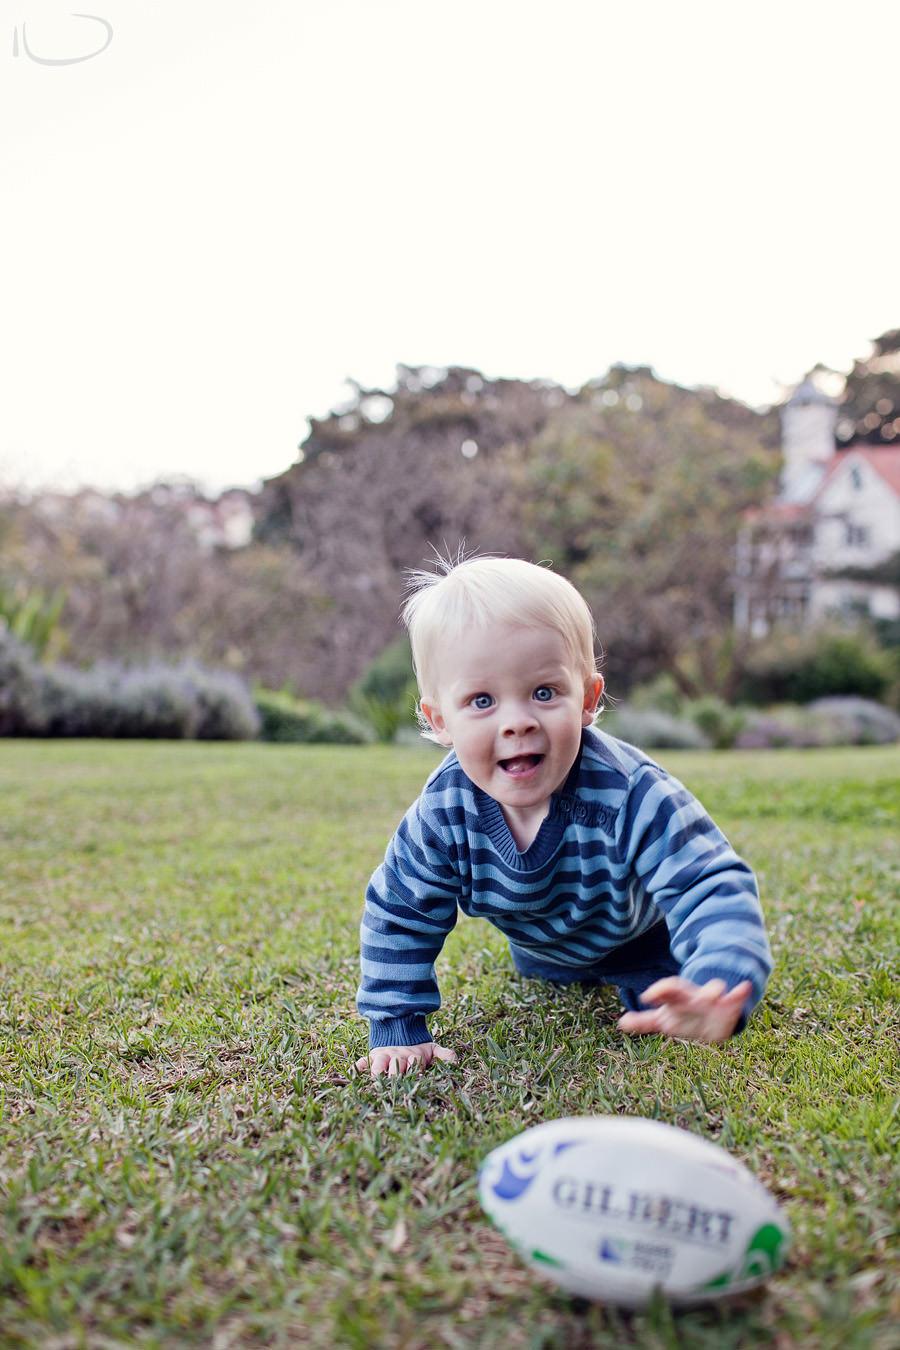 Lavendar Bay Baby Photographer: Baby crawling towards camera